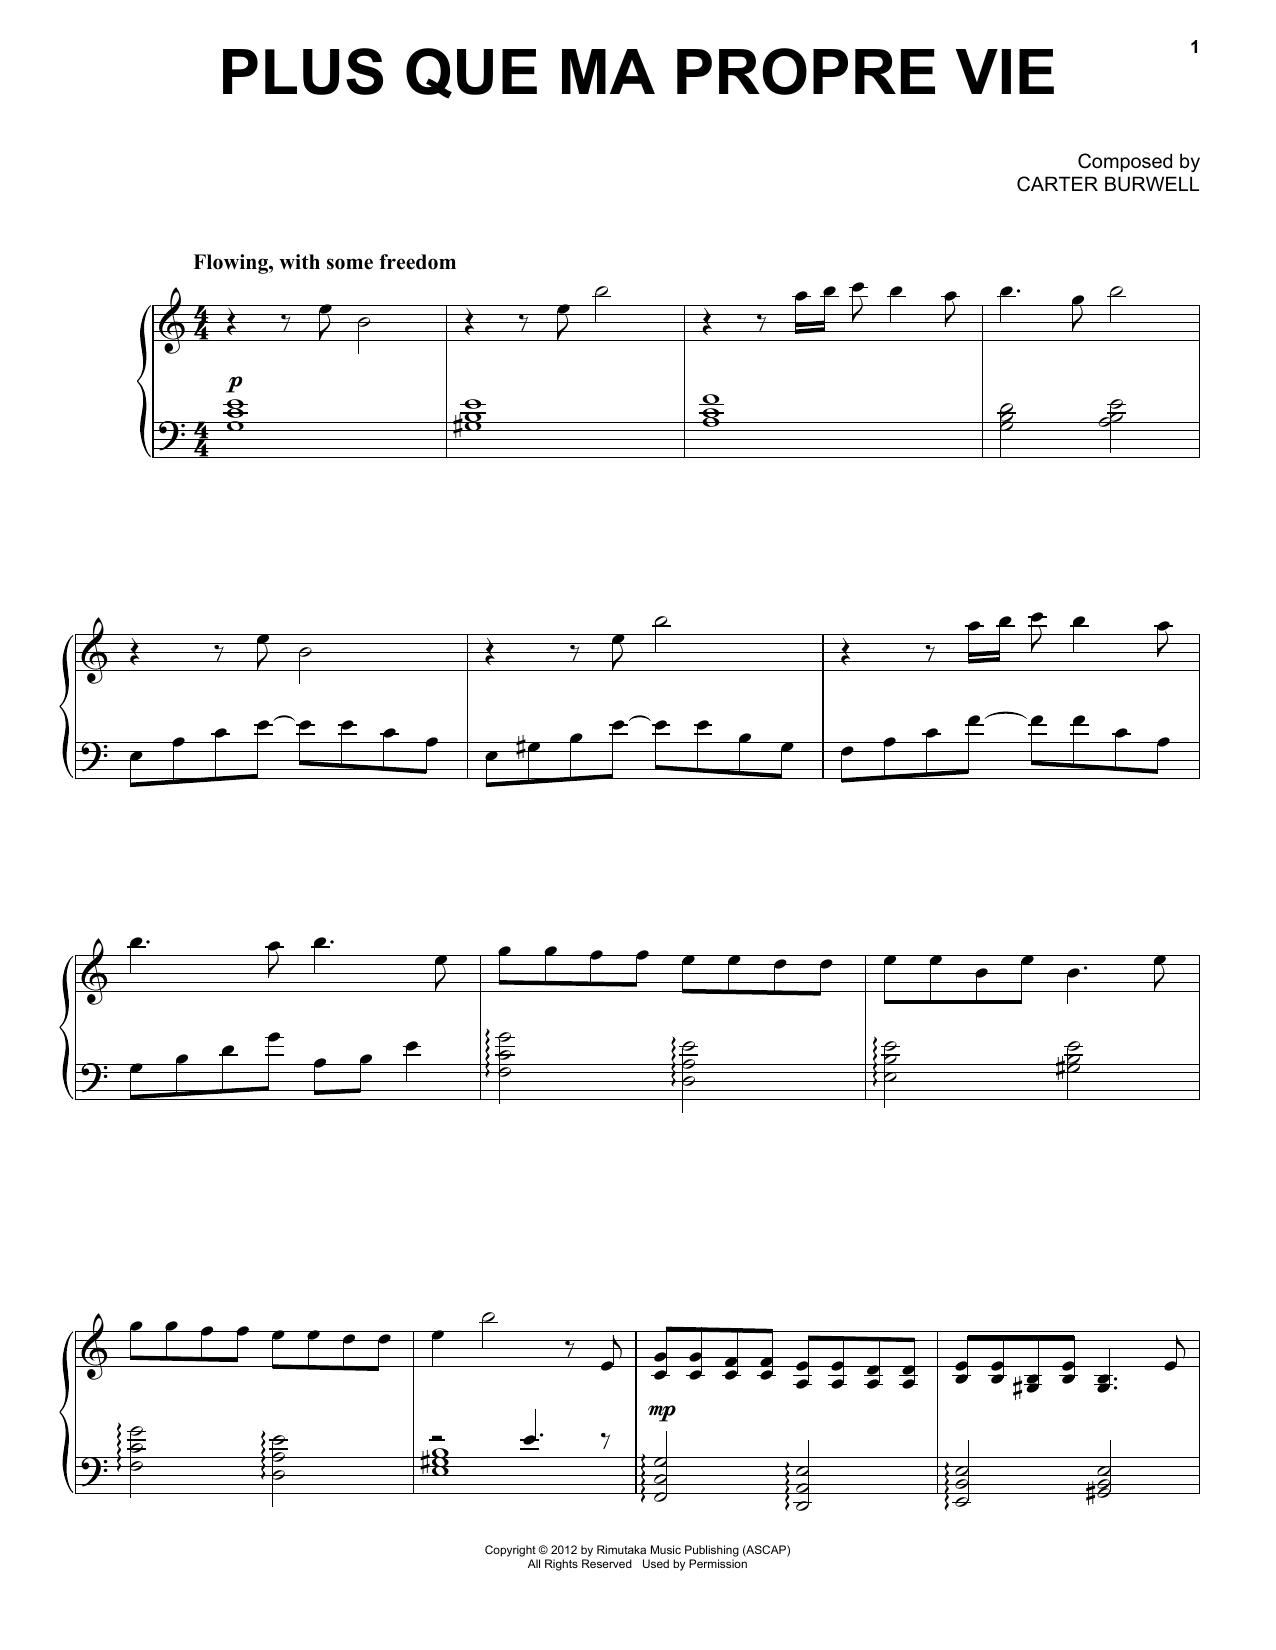 Partition piano Plus Que Ma Propre Vie de Carter Burwell - Piano Voix Guitare (Mélodie Main Droite)